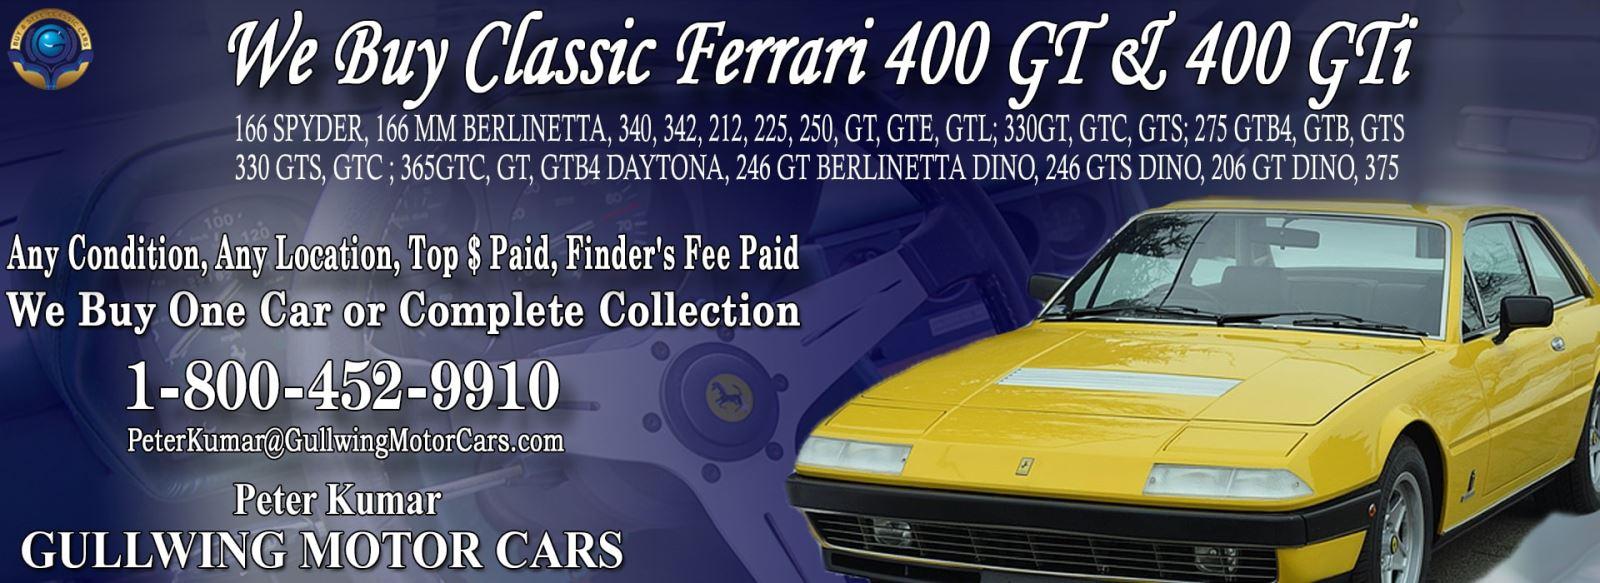 Classic Ferrari 400 GT 400 GTi for sale, we buy vintage Ferrari 400GT 400GTi. Call Peter Kumar. Gullwing Motor